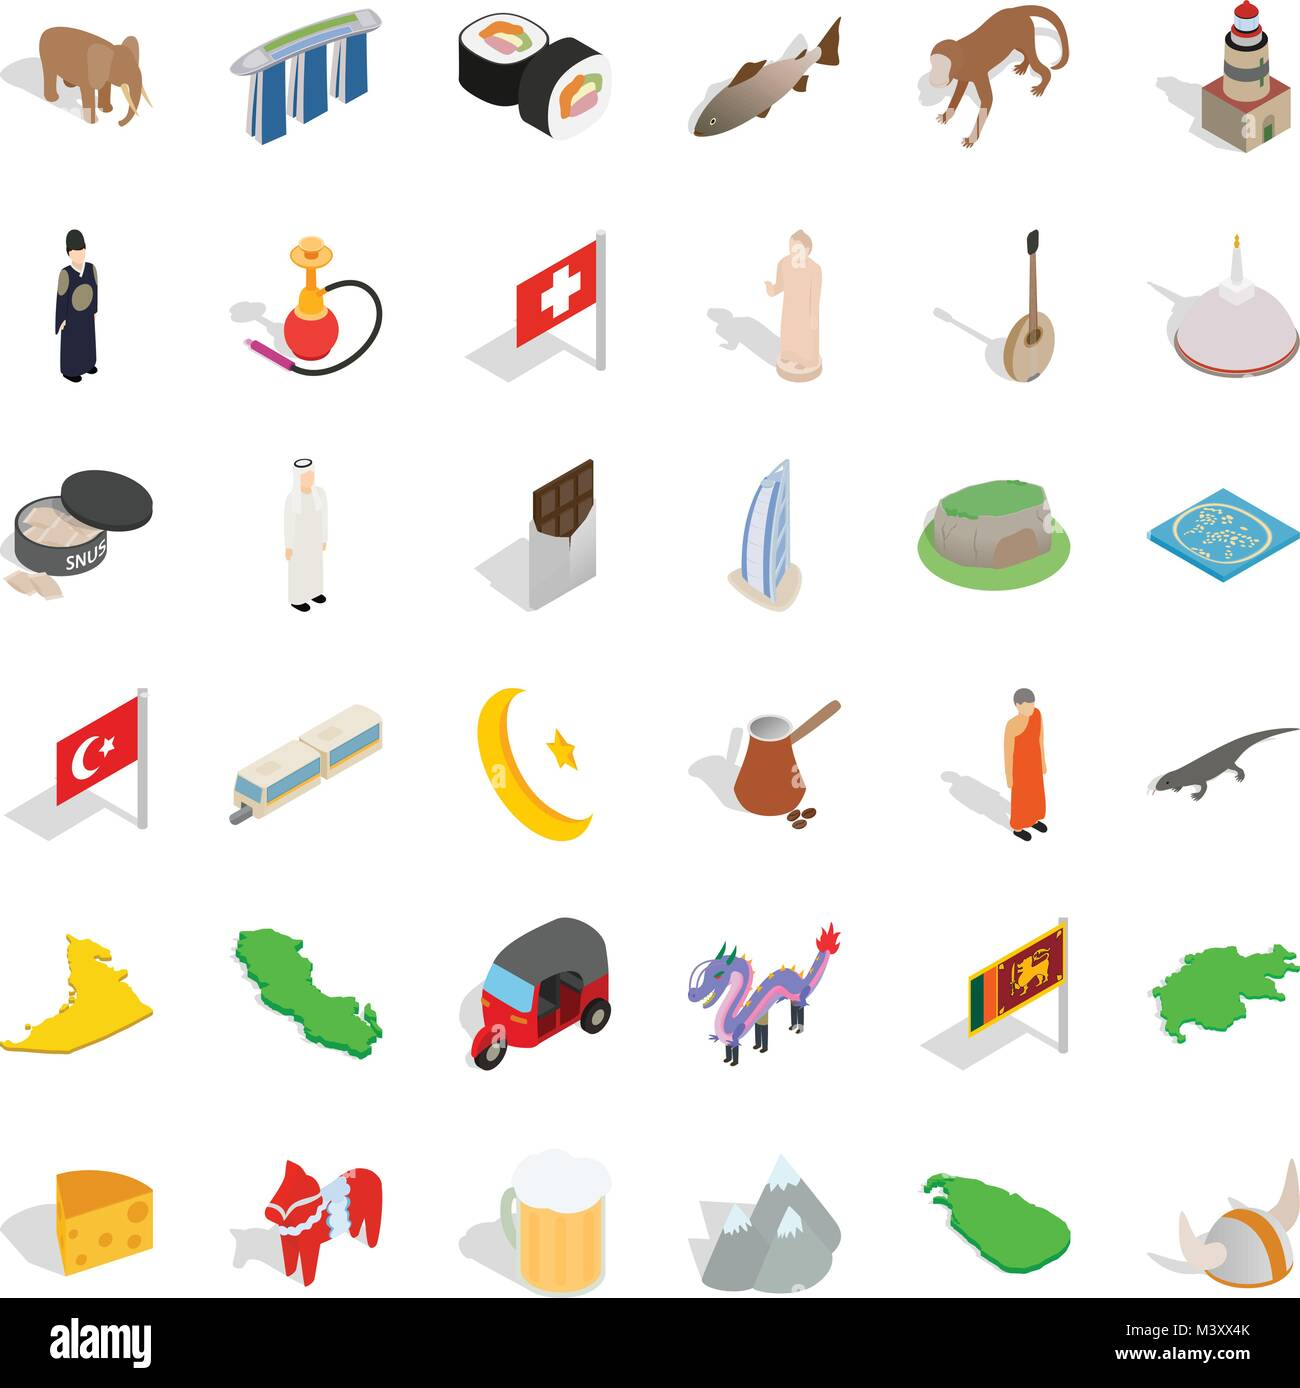 Underage icons set, isometric style - Stock Vector